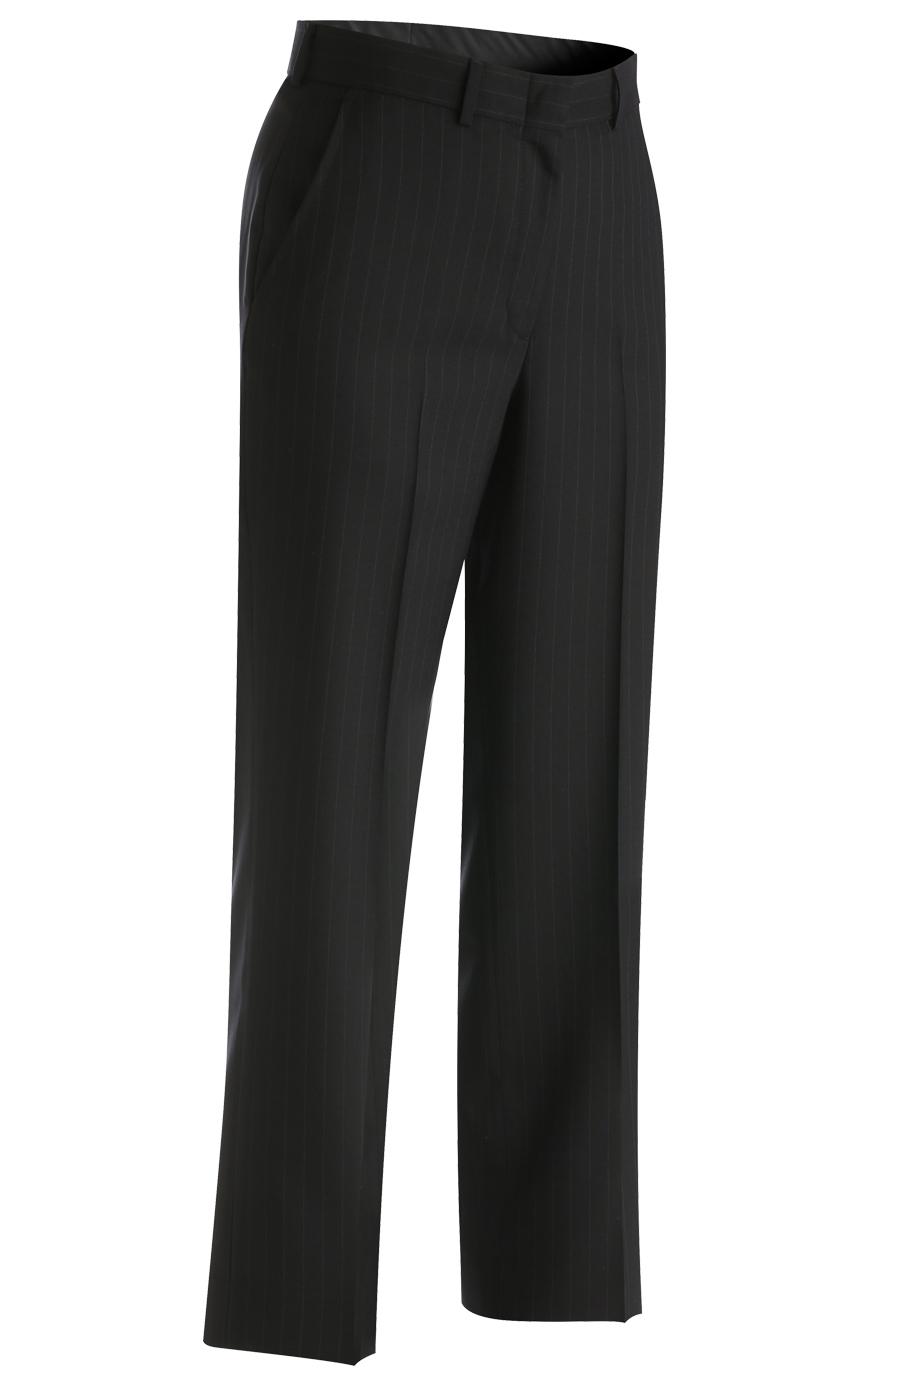 Edwards Mens Flat Front Pinstripe Dress Pant